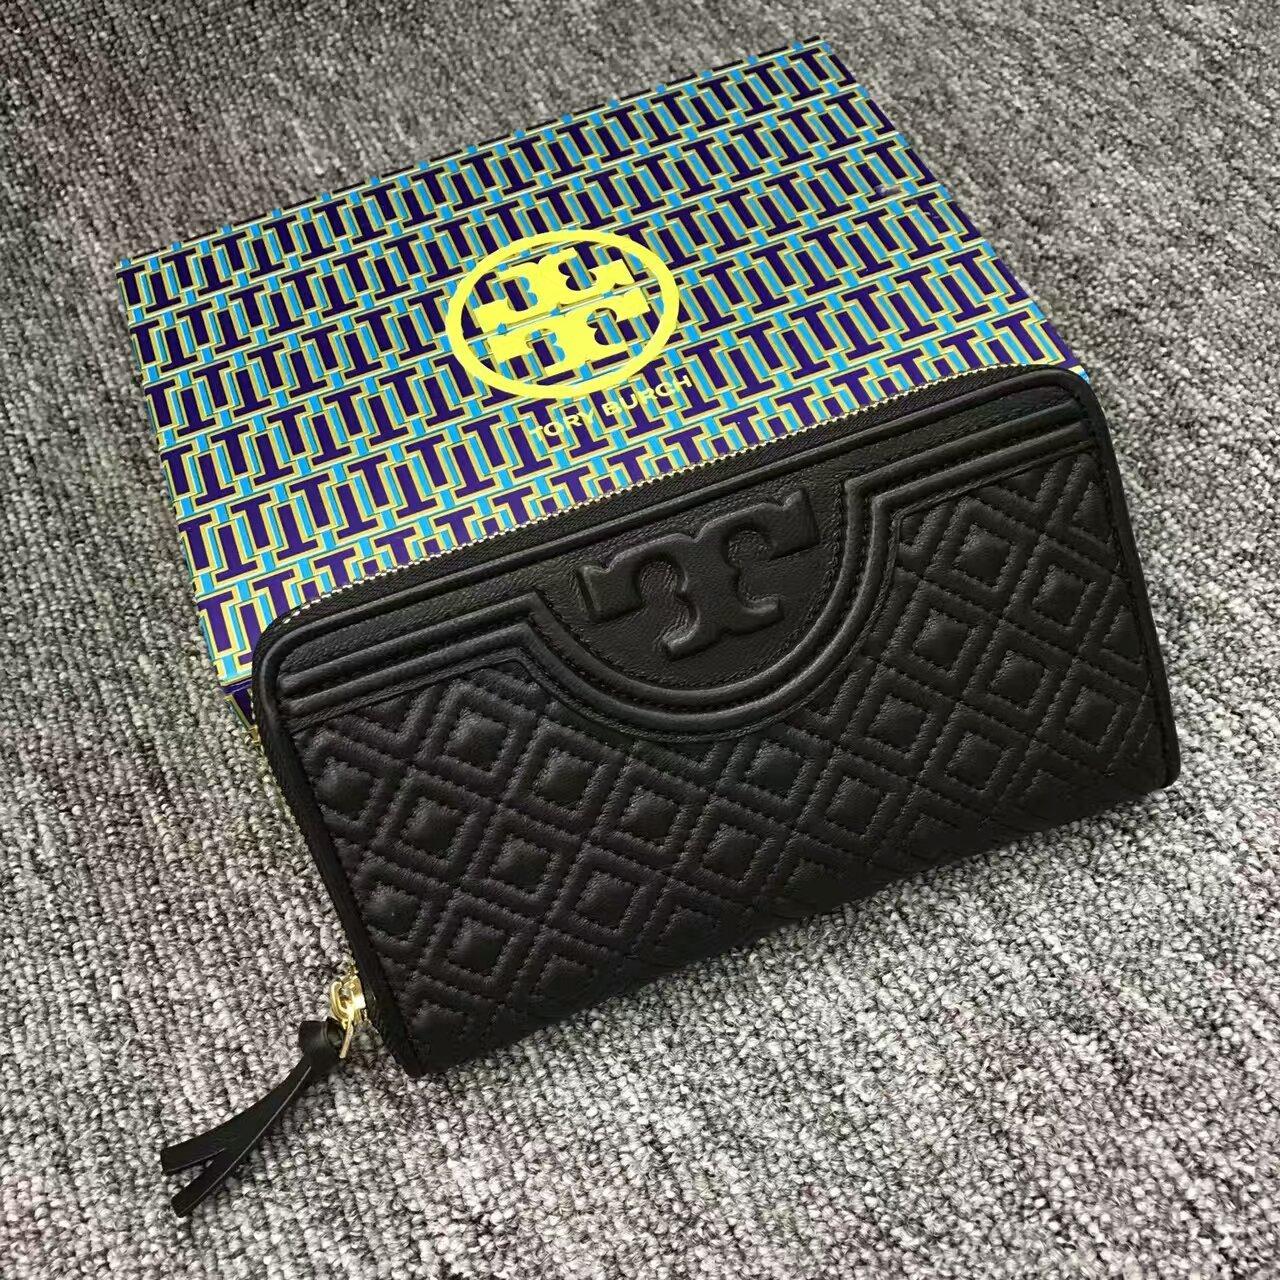 3f4ecf743f0c Mmexport1481900263020. Mmexport1481900263020. Previous. Black Tory Burch  Fleming Zip Continental Wallet · Black ...